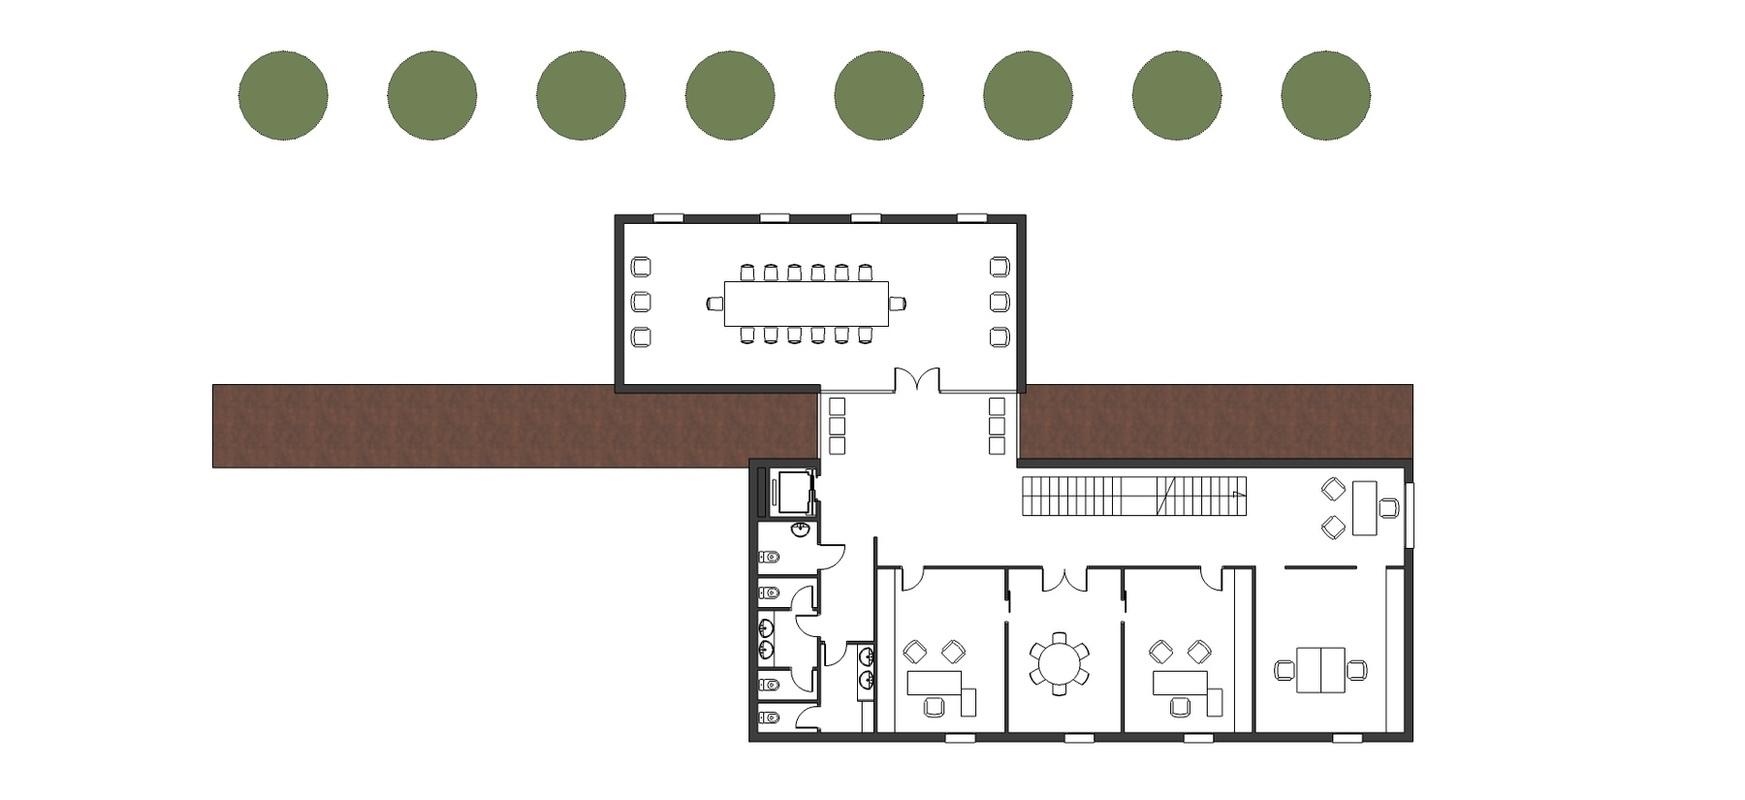 arqestudiBOMON - planta primera / first floor